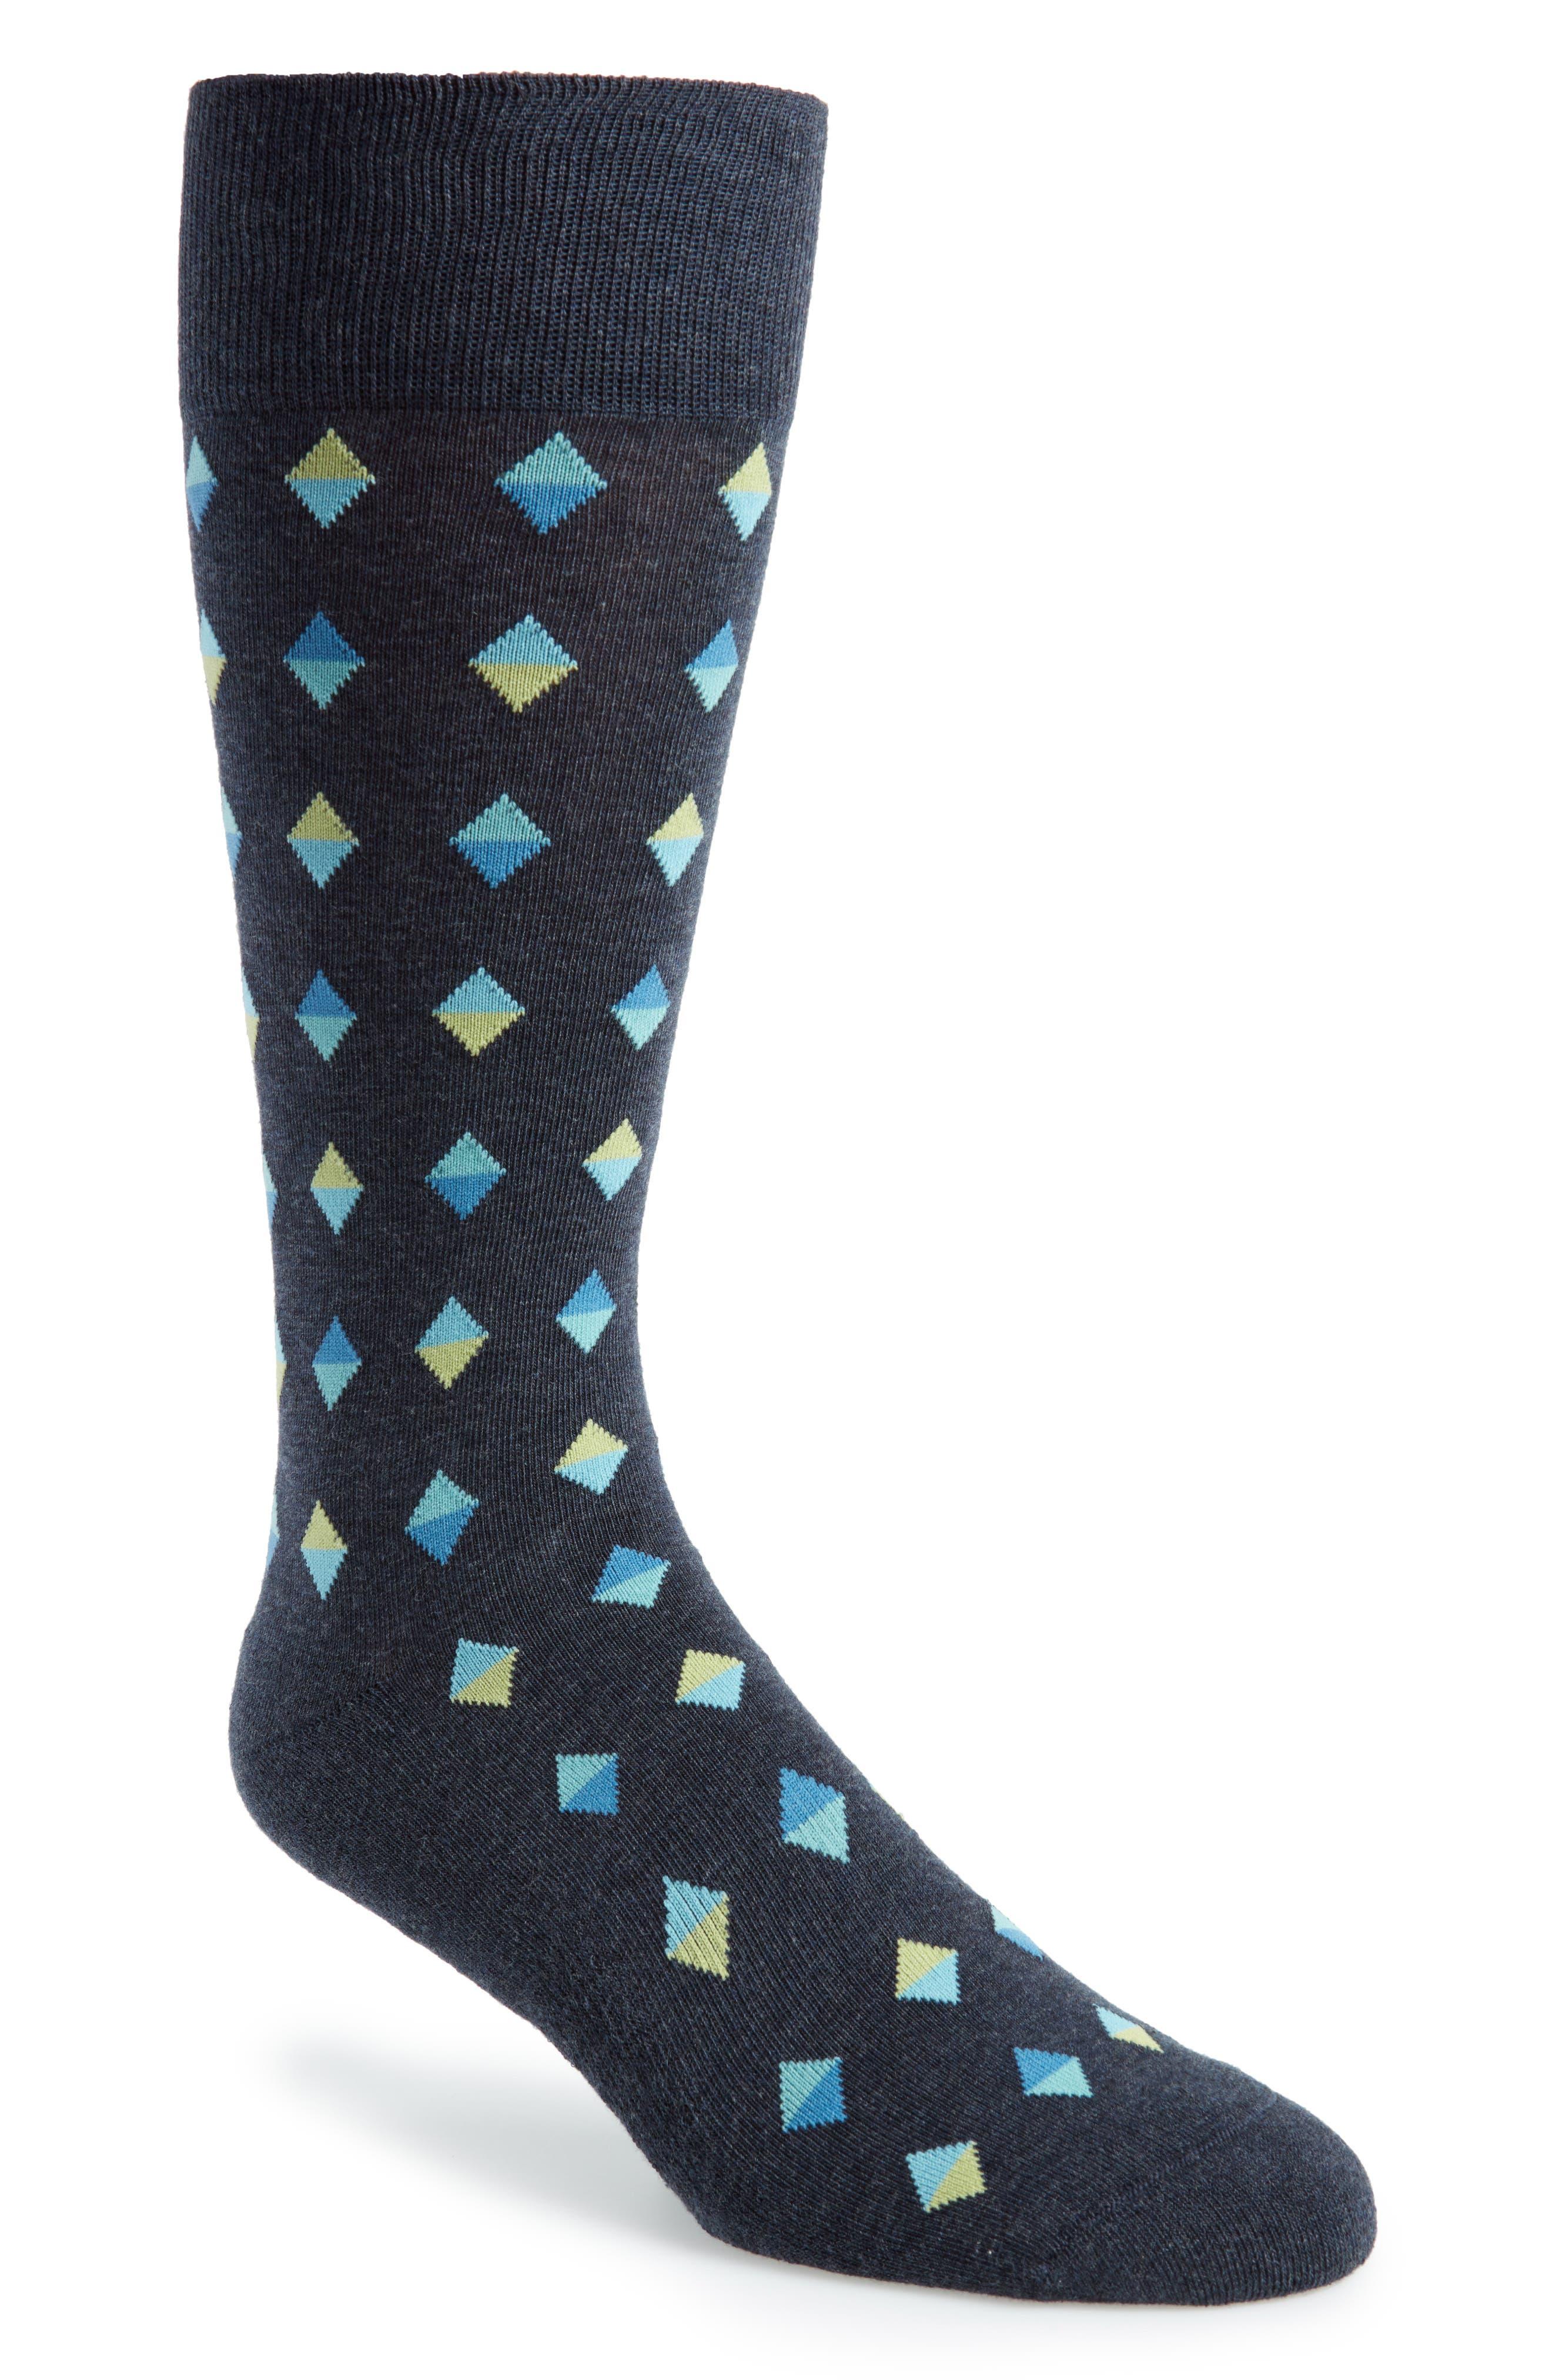 Spliced Diamonds Socks,                             Main thumbnail 1, color,                             Navy/ Chartreuse